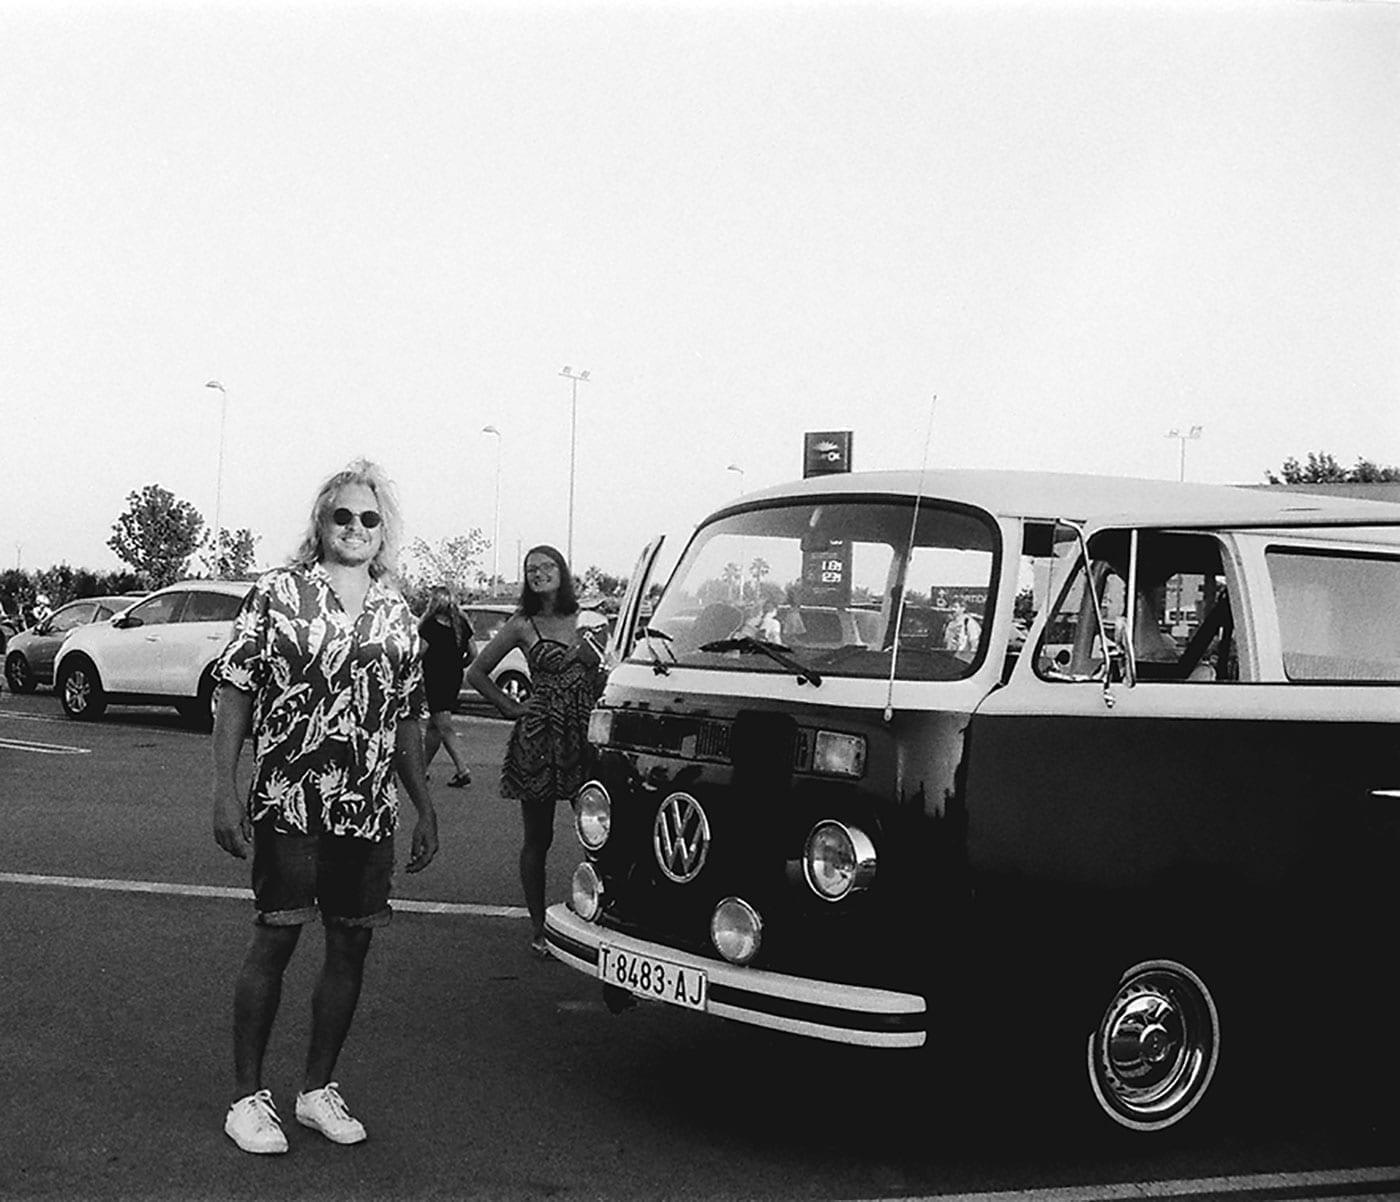 analog, Minolta, 35 mm, Bulli, T2,  Volkswagen, Oldtimer, Costa Brava im Vintage-Style